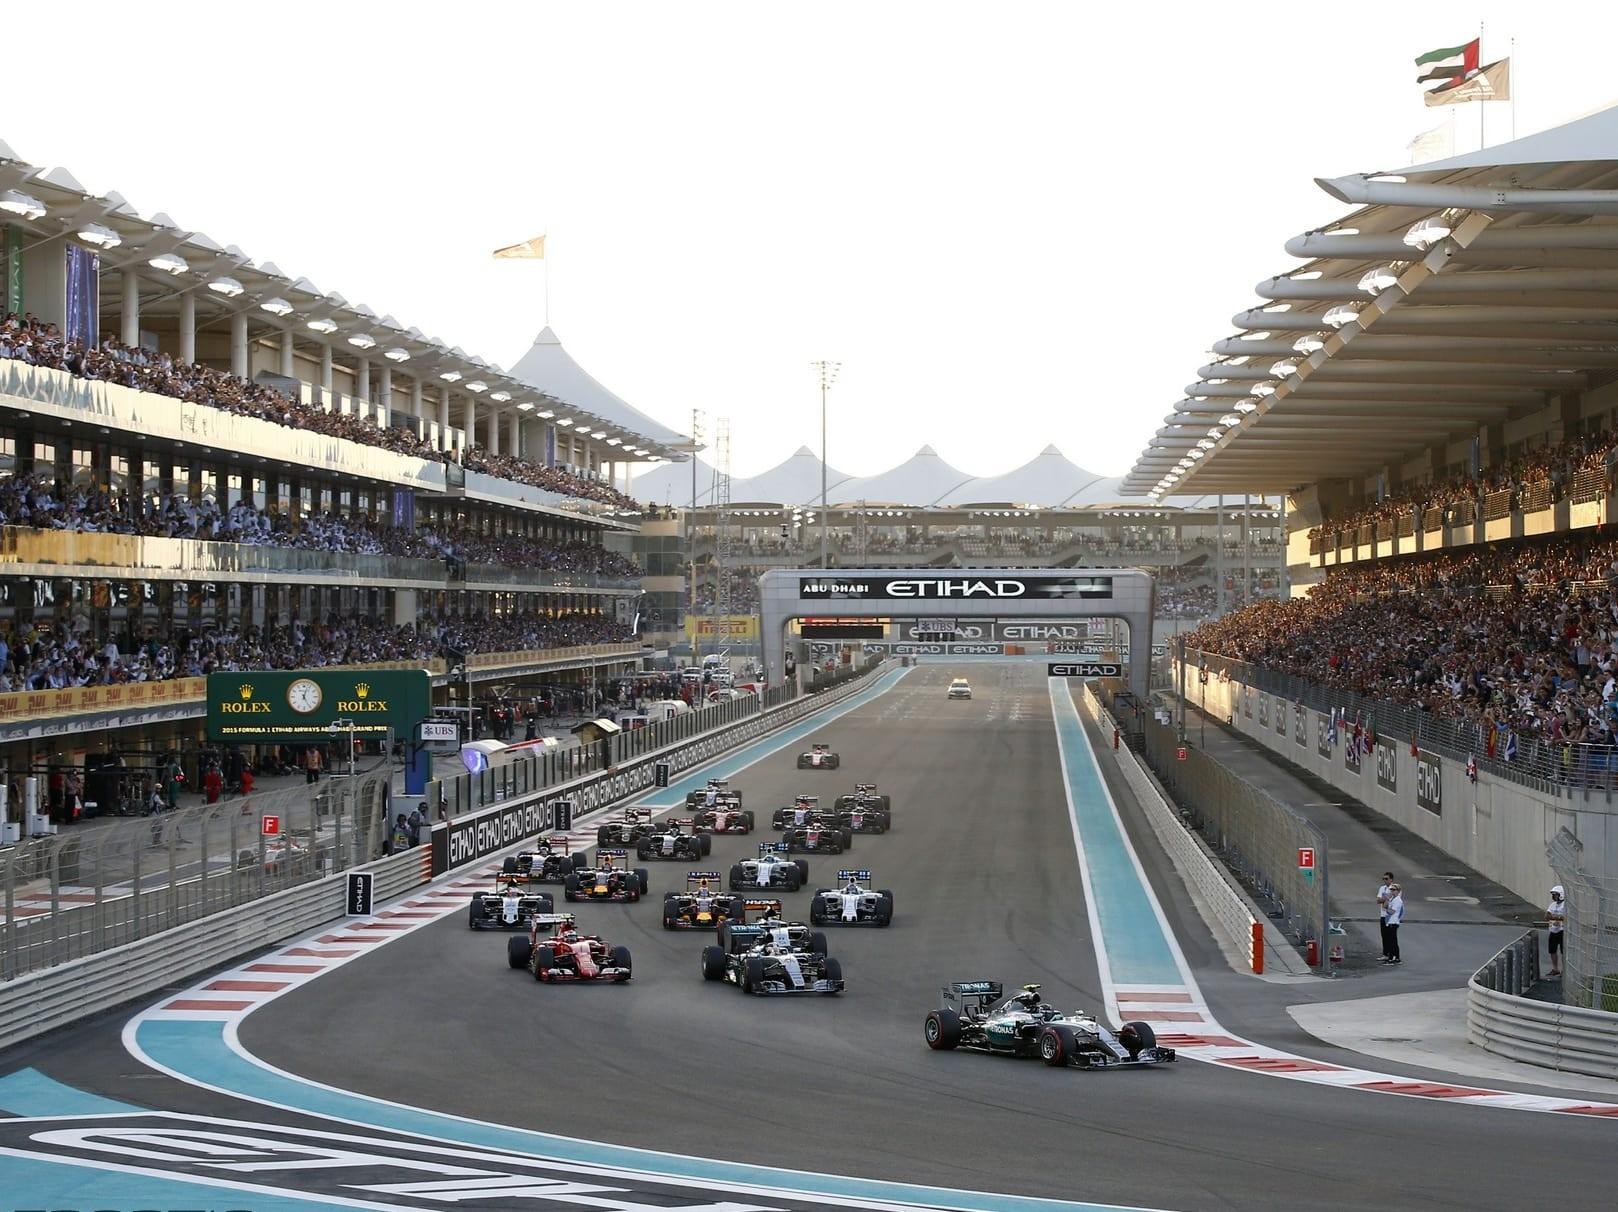 Rosberg makes it a hat-trick at Abu Dhabi